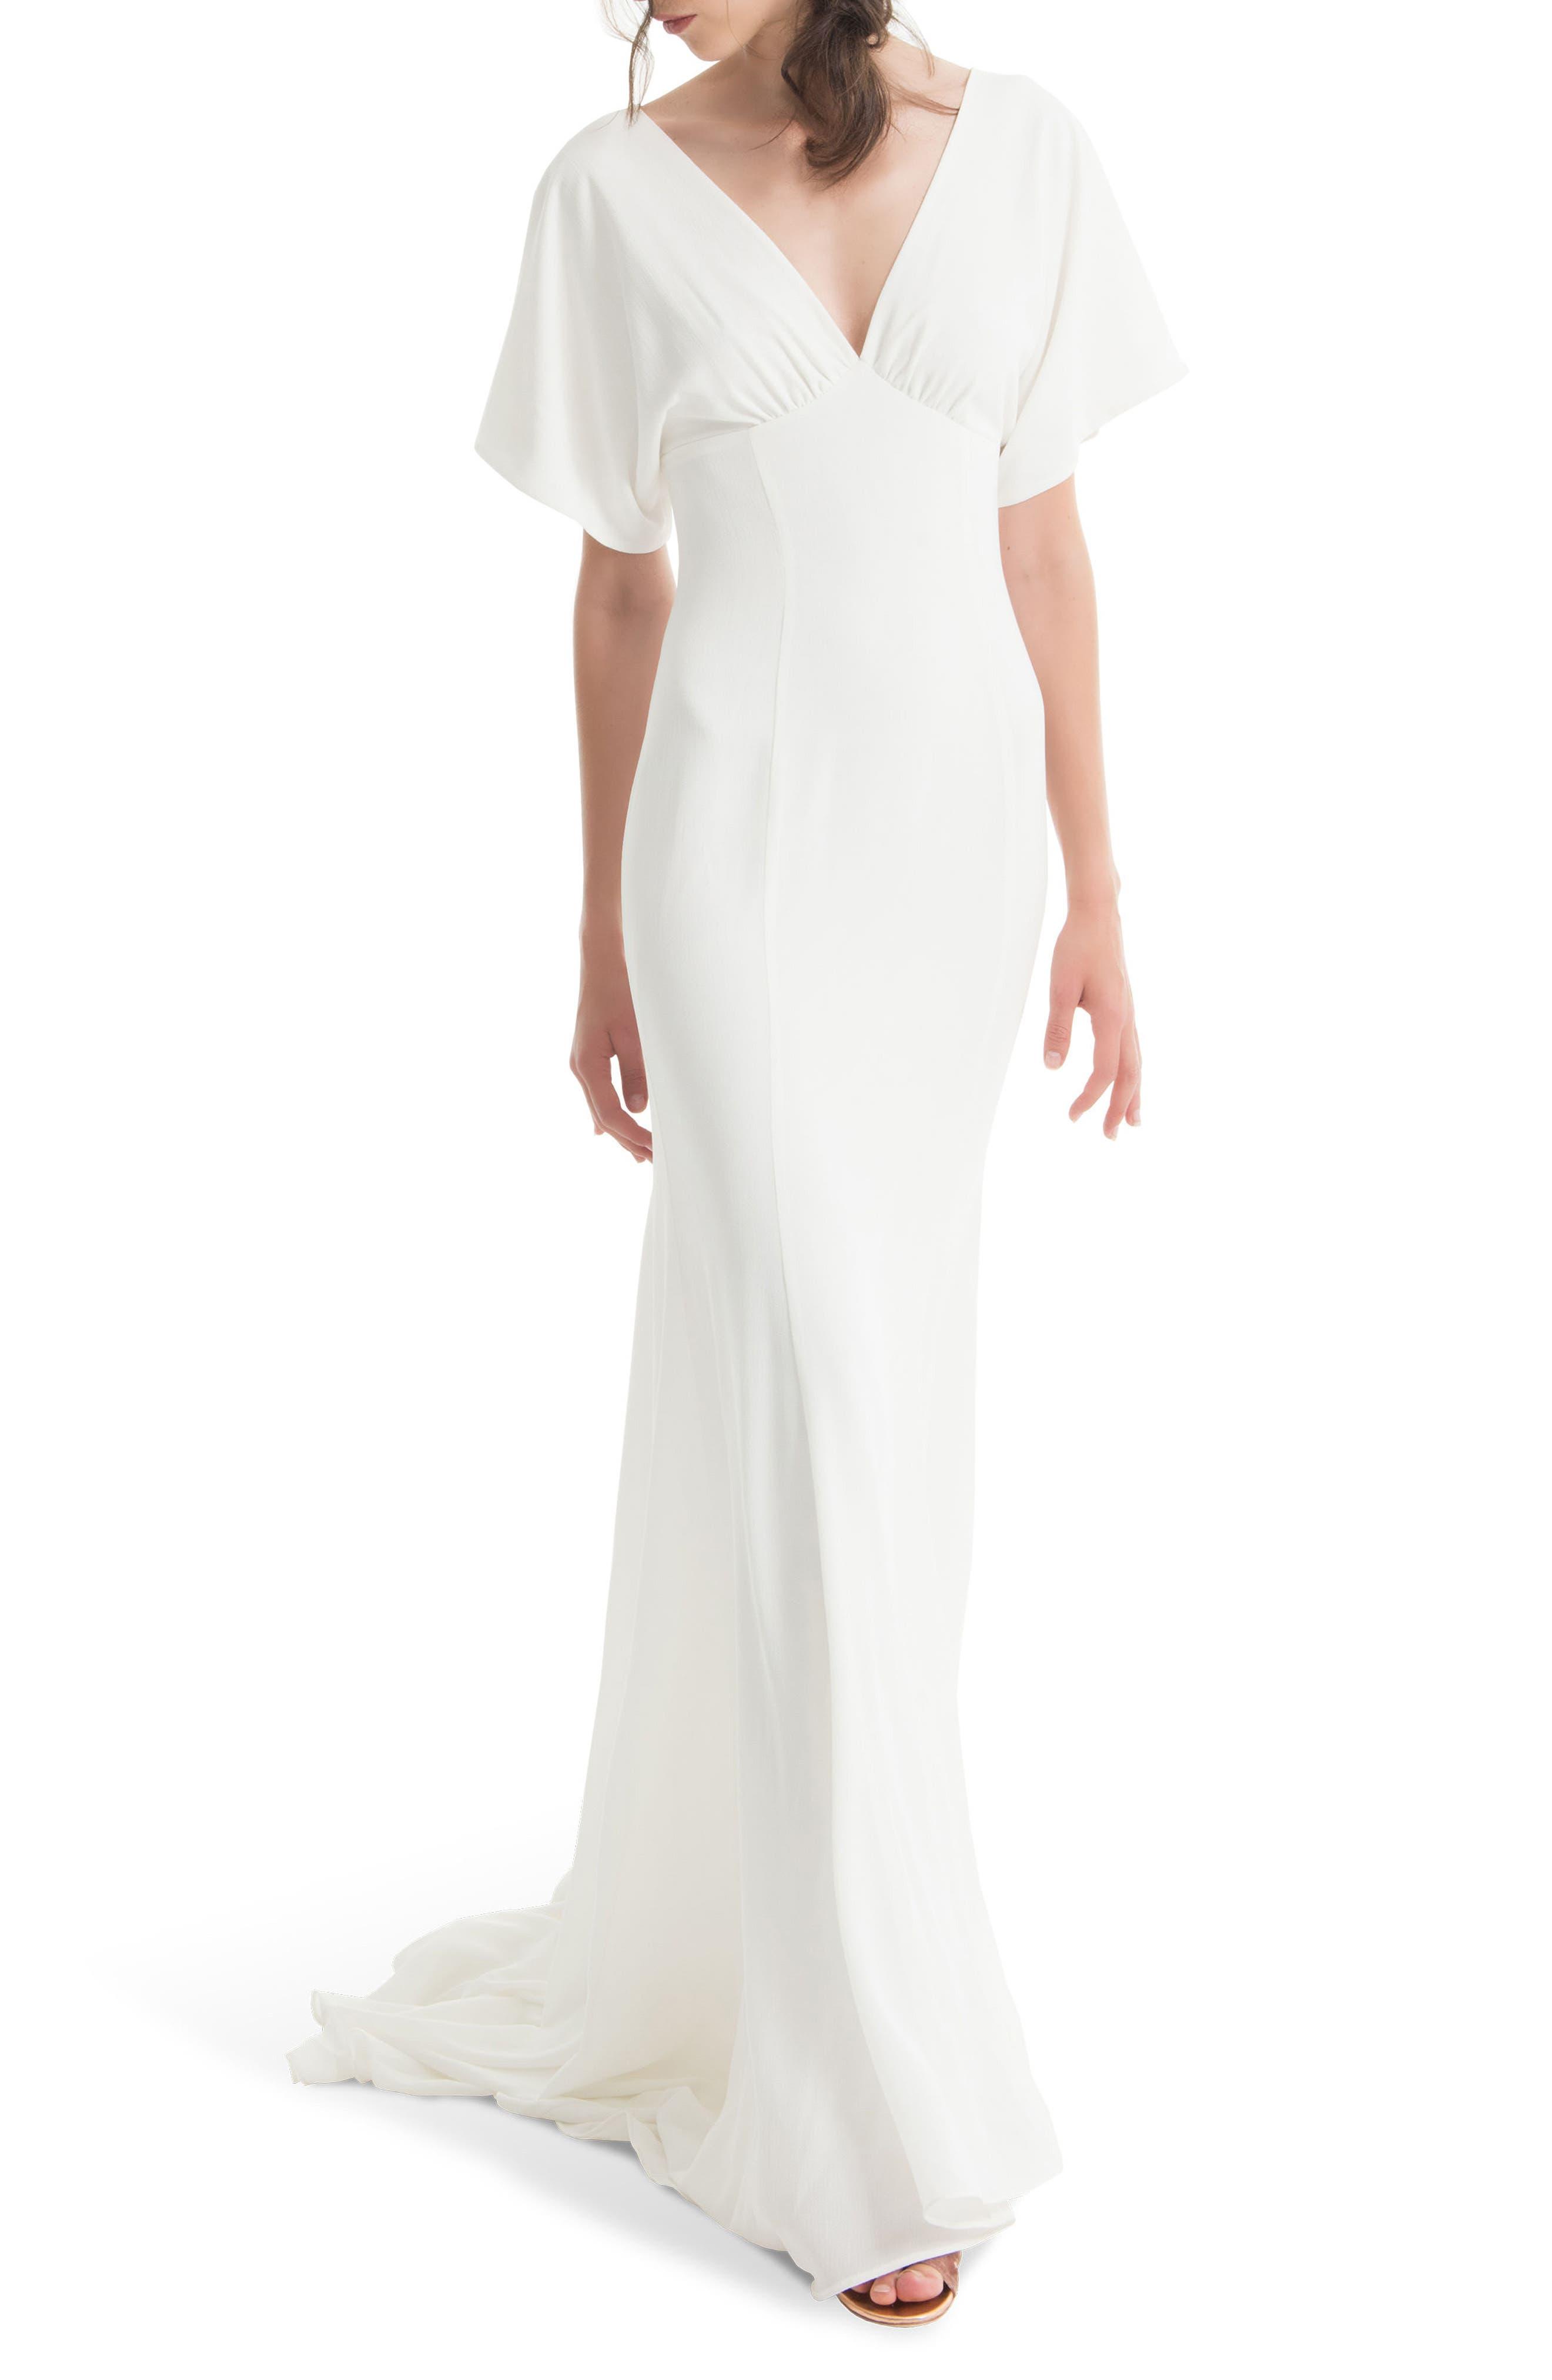 JOANNA AUGUST, Pattie Empire Waist Crepe Gown, Main thumbnail 1, color, WHITE